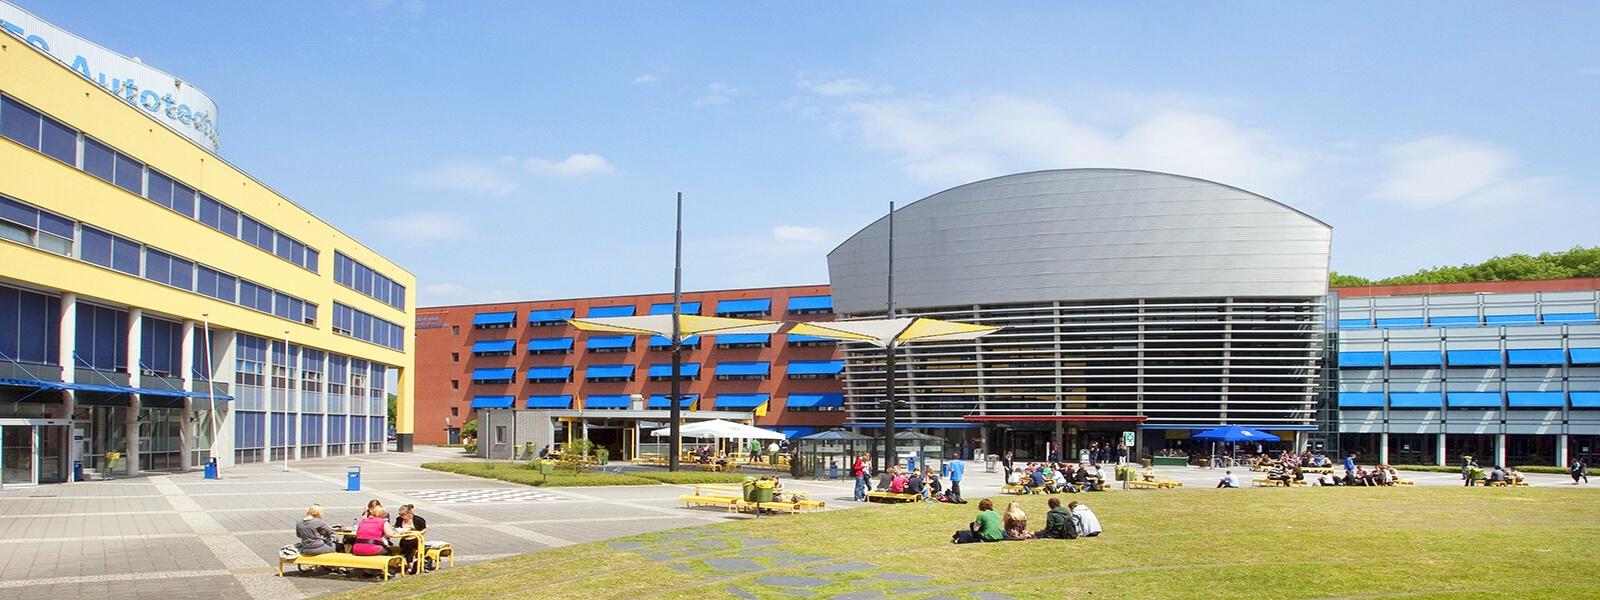 studyinholland-universitiesofappliedsciences-HAN-Arnhem-Nijmegen-holland.